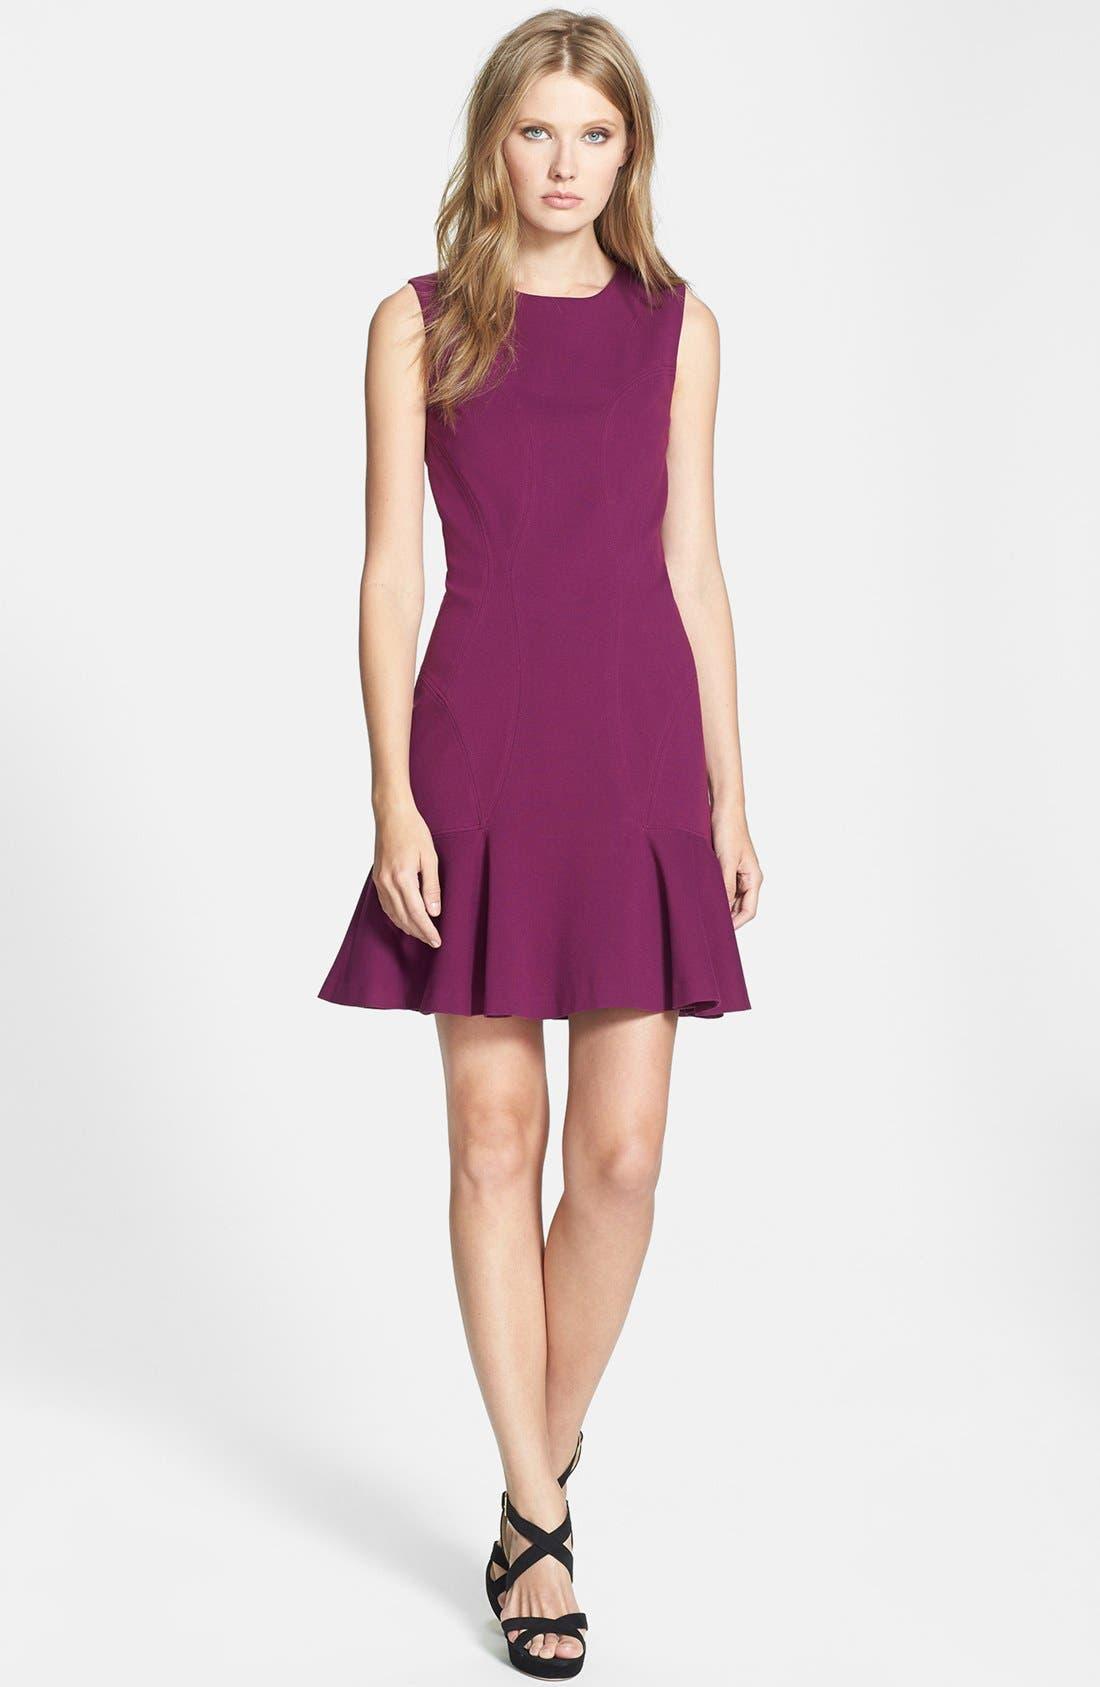 Alternate Image 1 Selected - Diane von Furstenberg 'Jaelyn' Ponte Sheath Dress